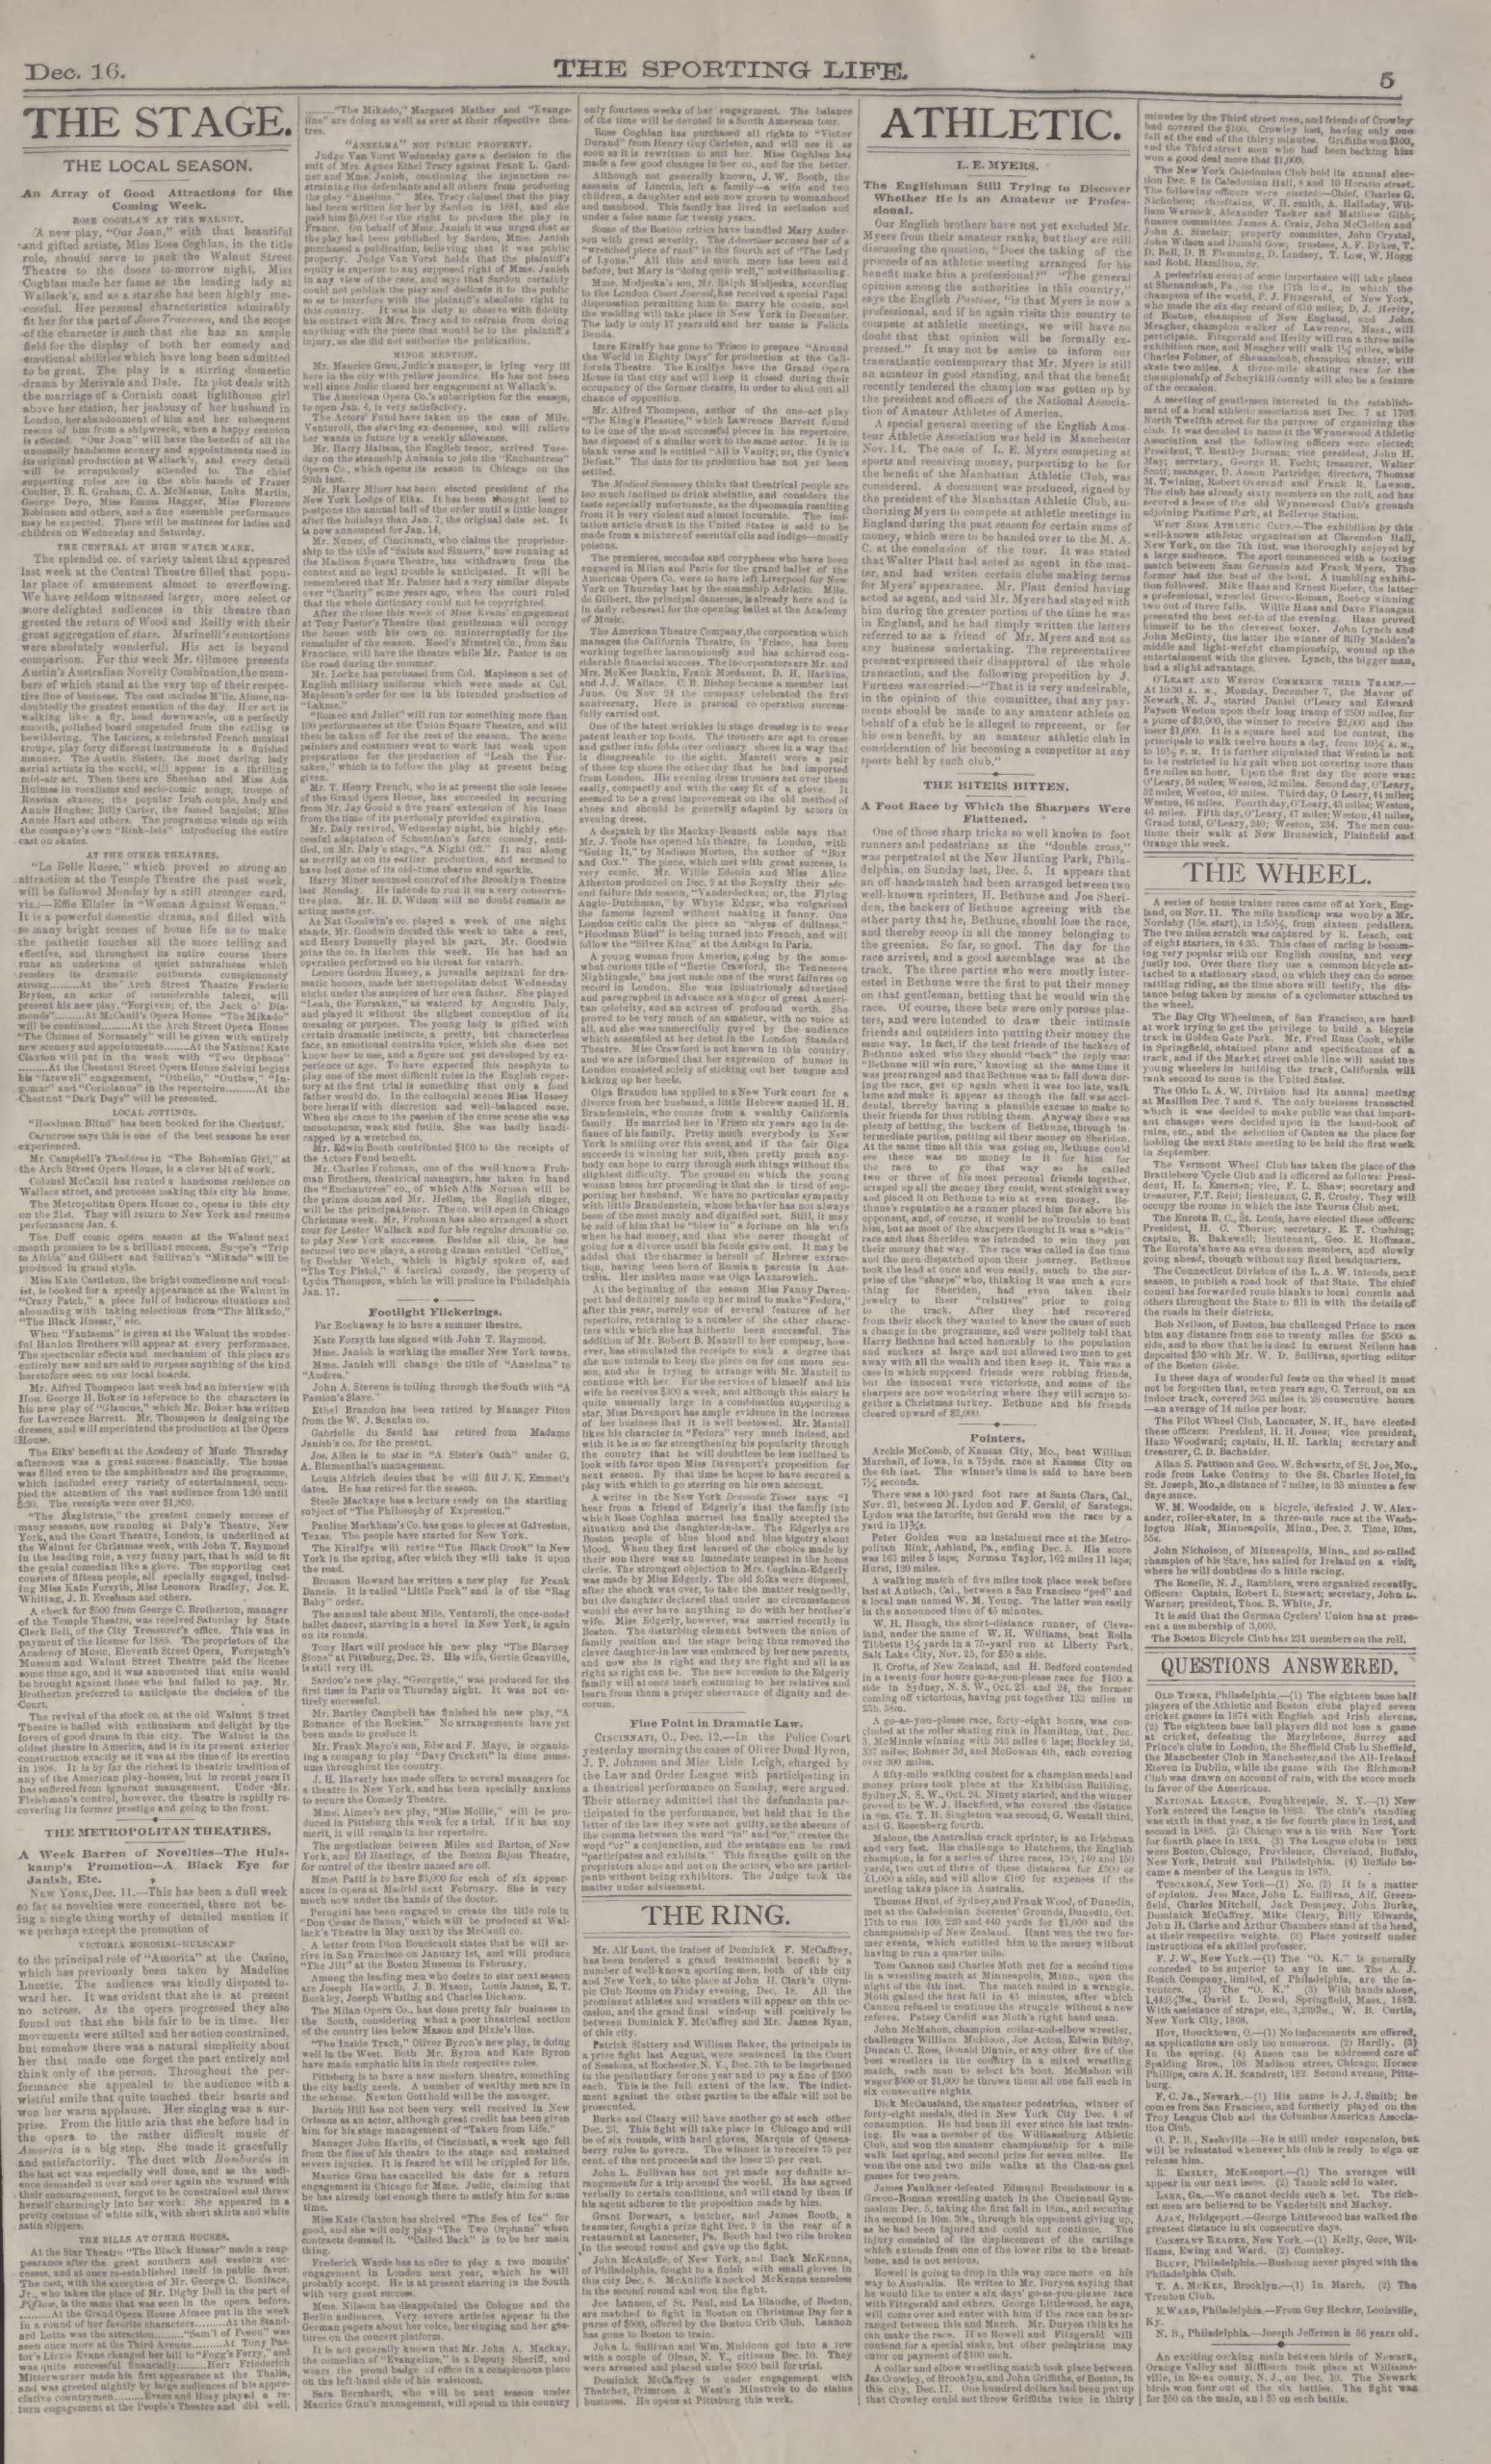 Decorum Brunswick, Ga Fresh Page 5 the Sporting Life Collection La84 Digital Library